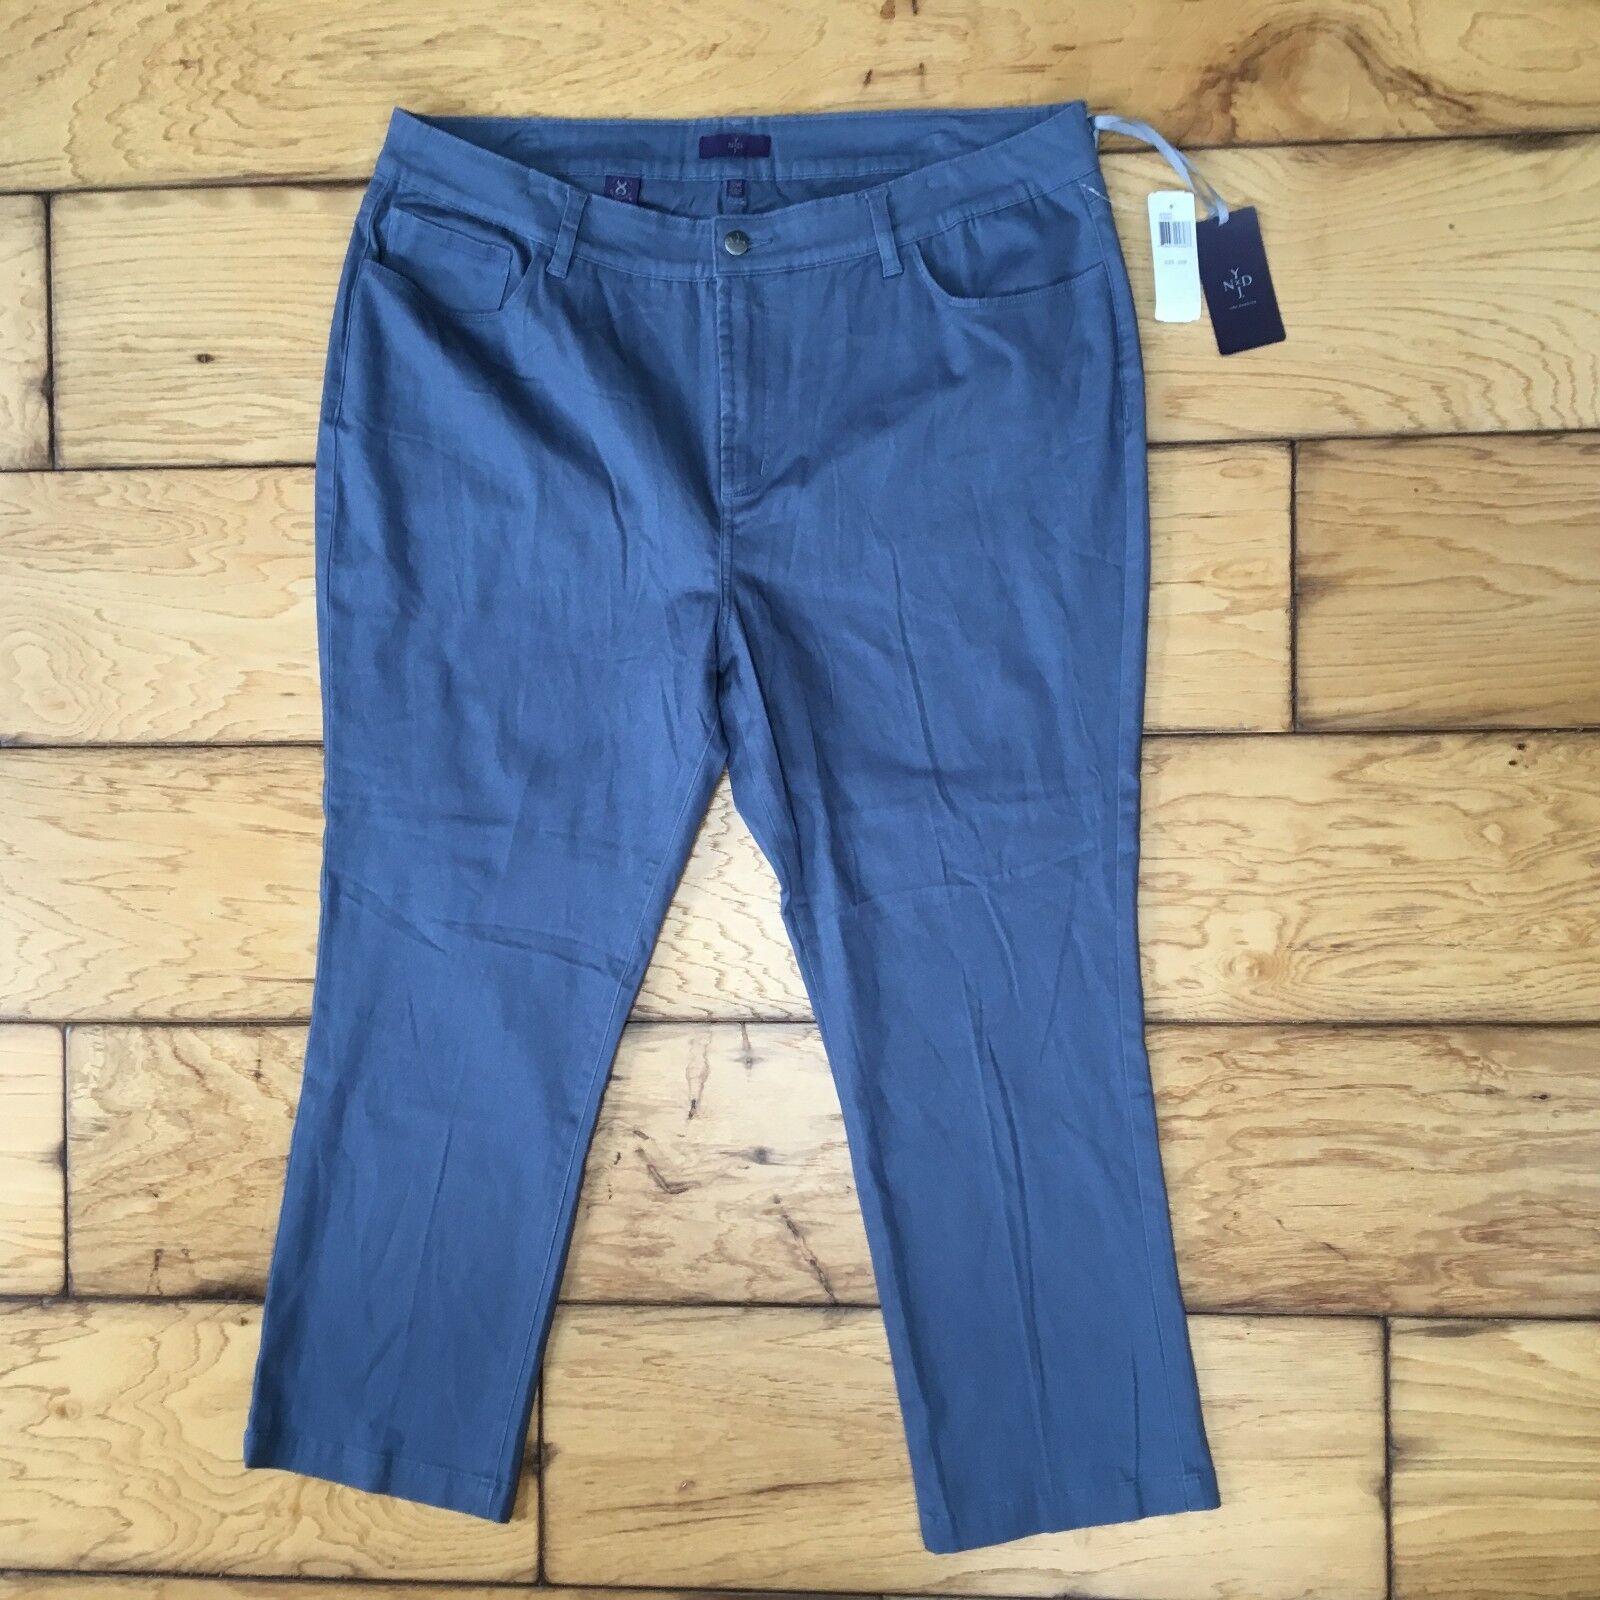 NYDJ Women Grey Blue Ankle Pants Original Slimming Fit Cornf